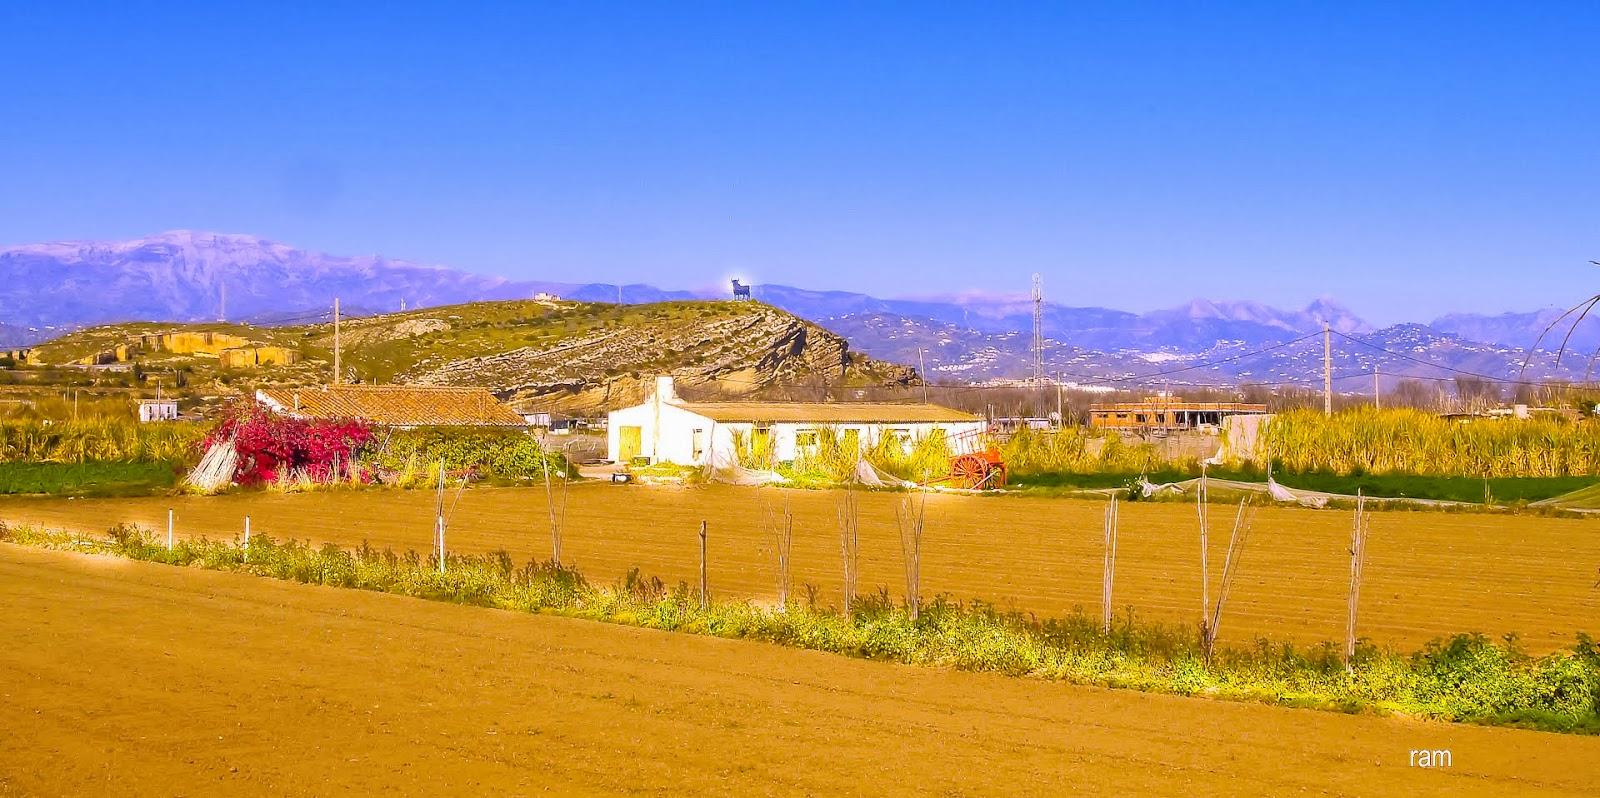 http://www.panoramio.com/photo/17941134